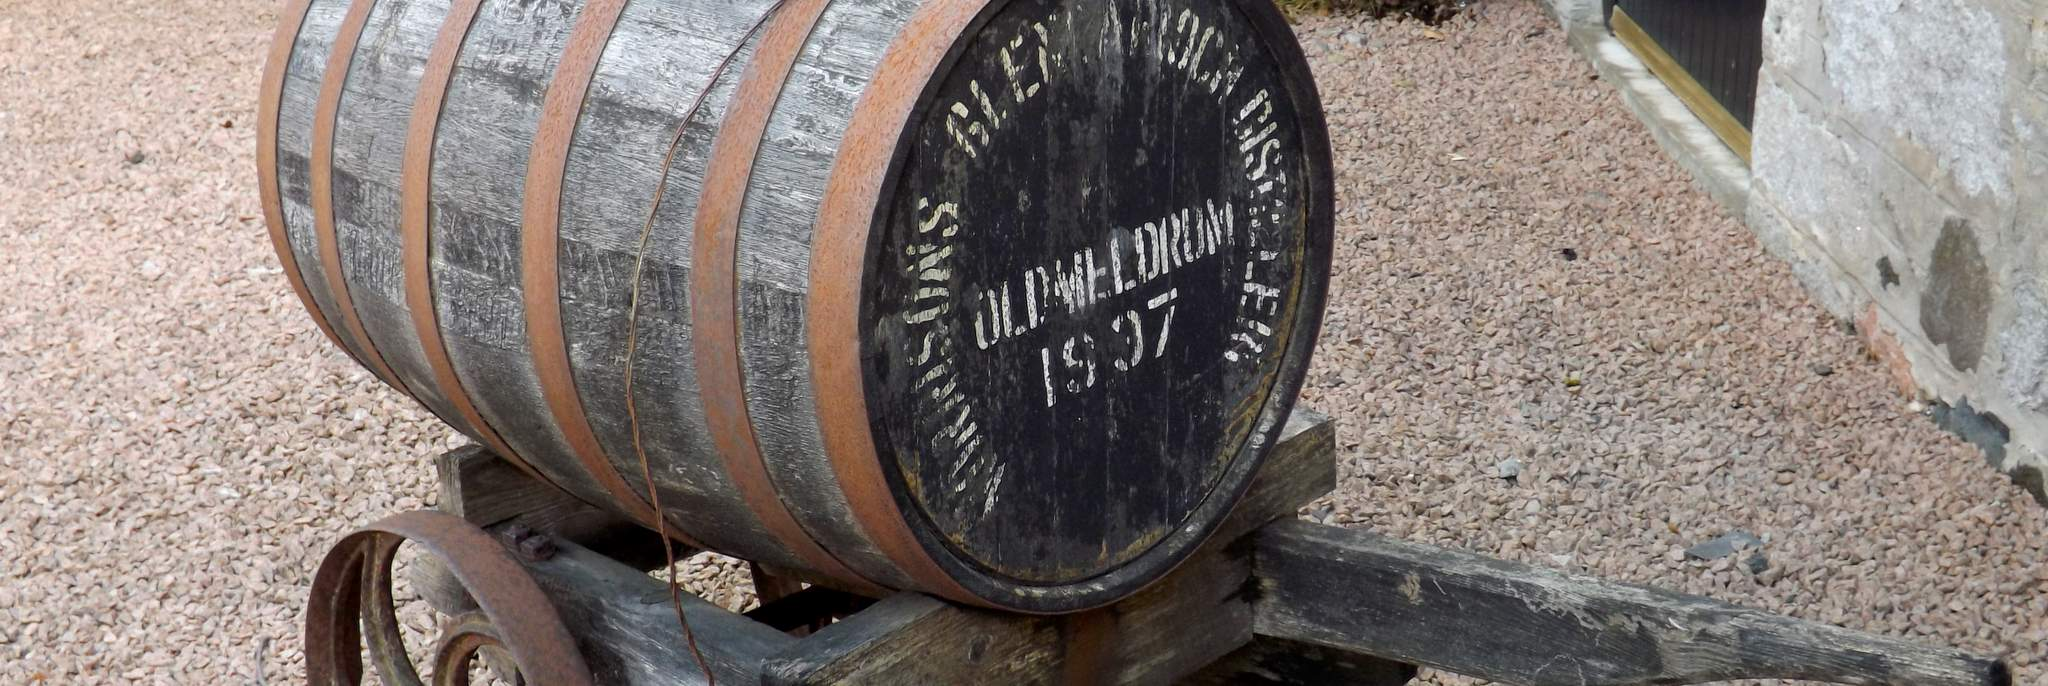 Whisky in Edinburgh & The Lothians